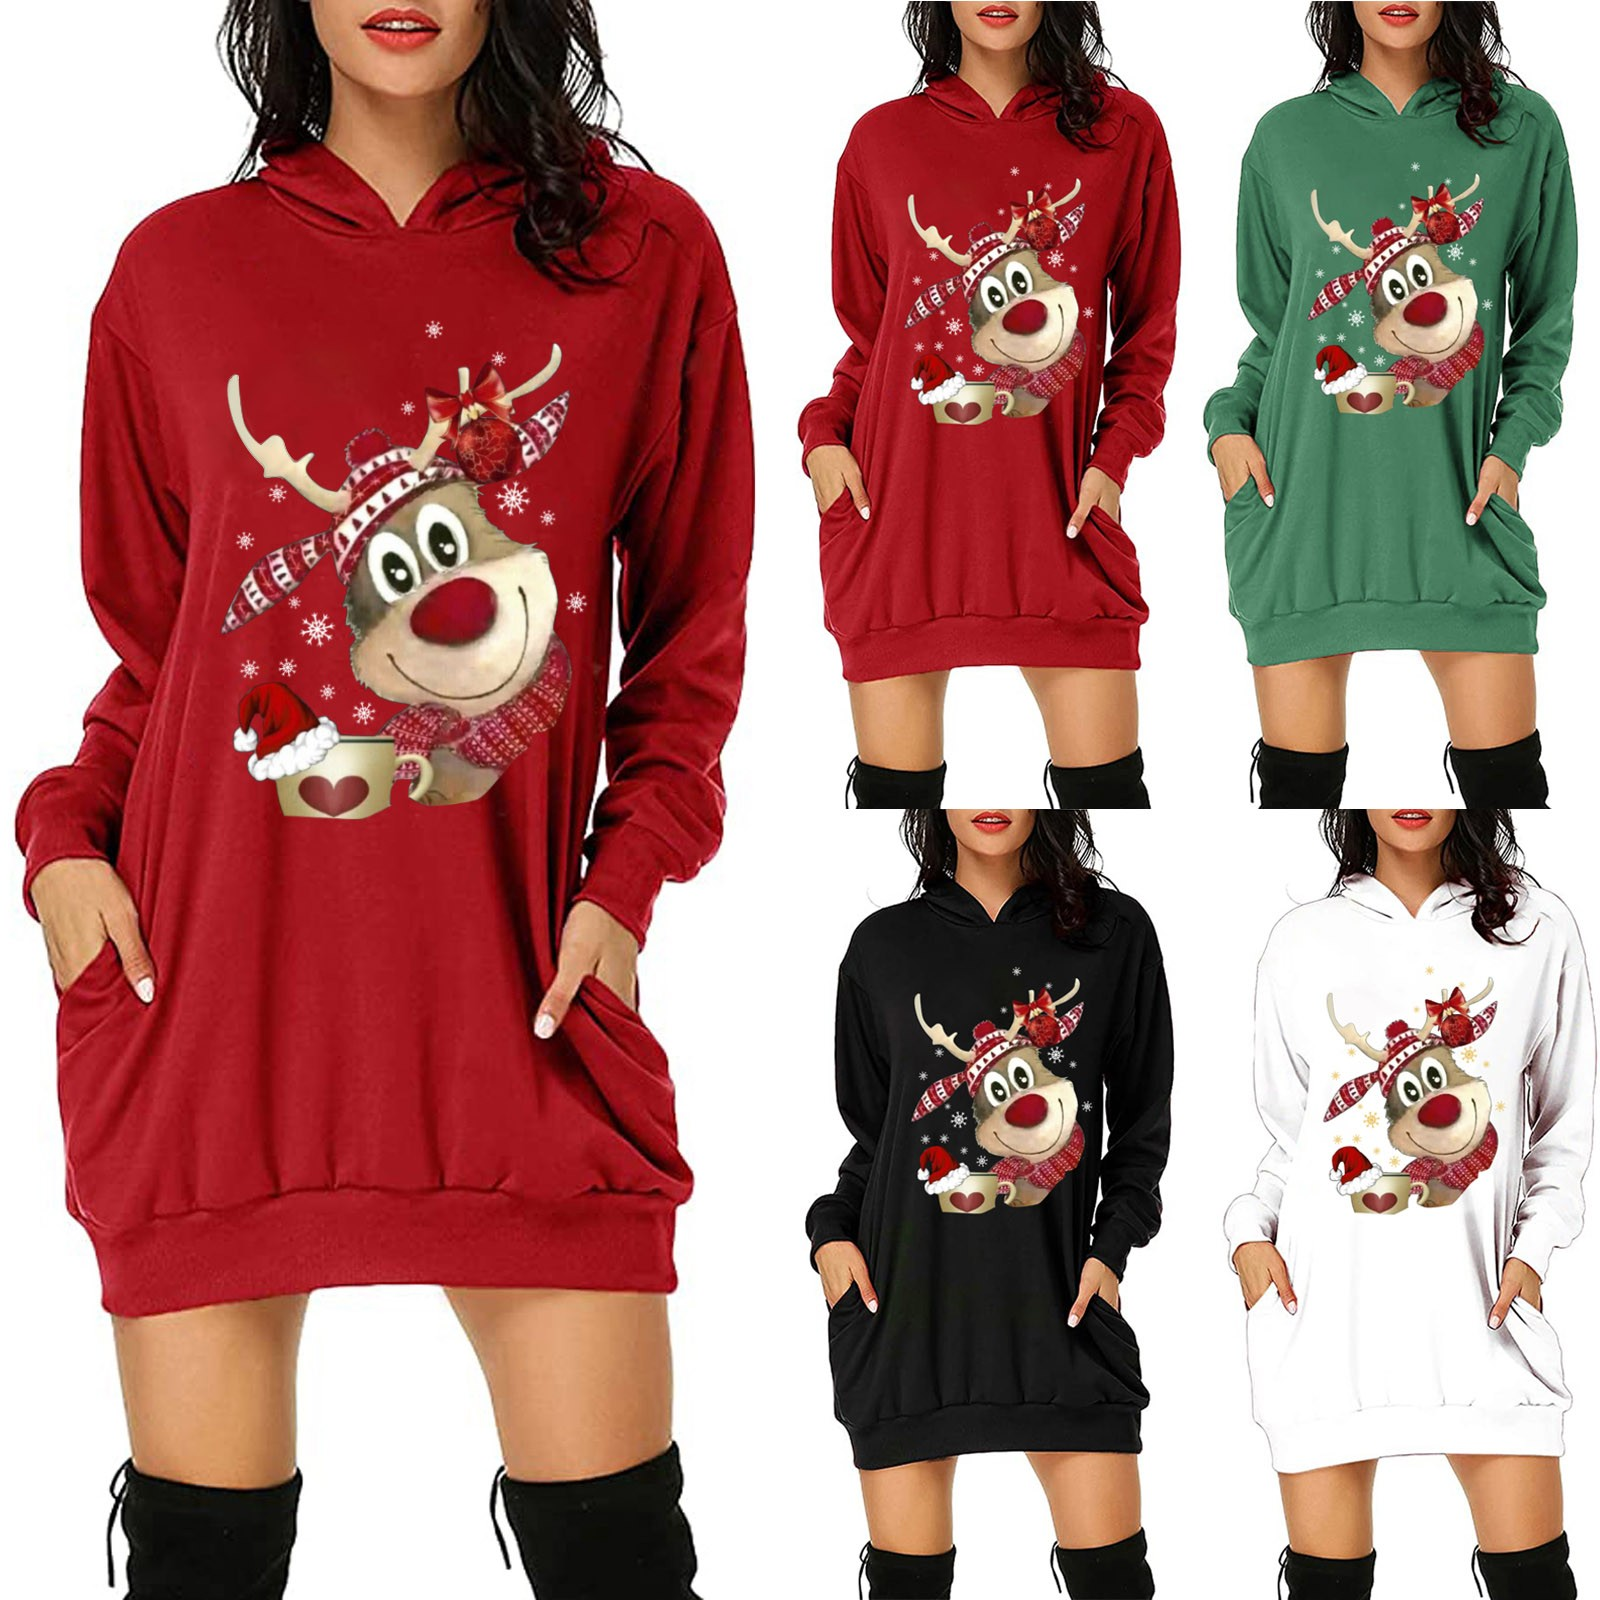 vestido de mujer Women s Fashion Christmas Hoodie Bag Hip Pocket Print Hoodie Fashion Dress femme